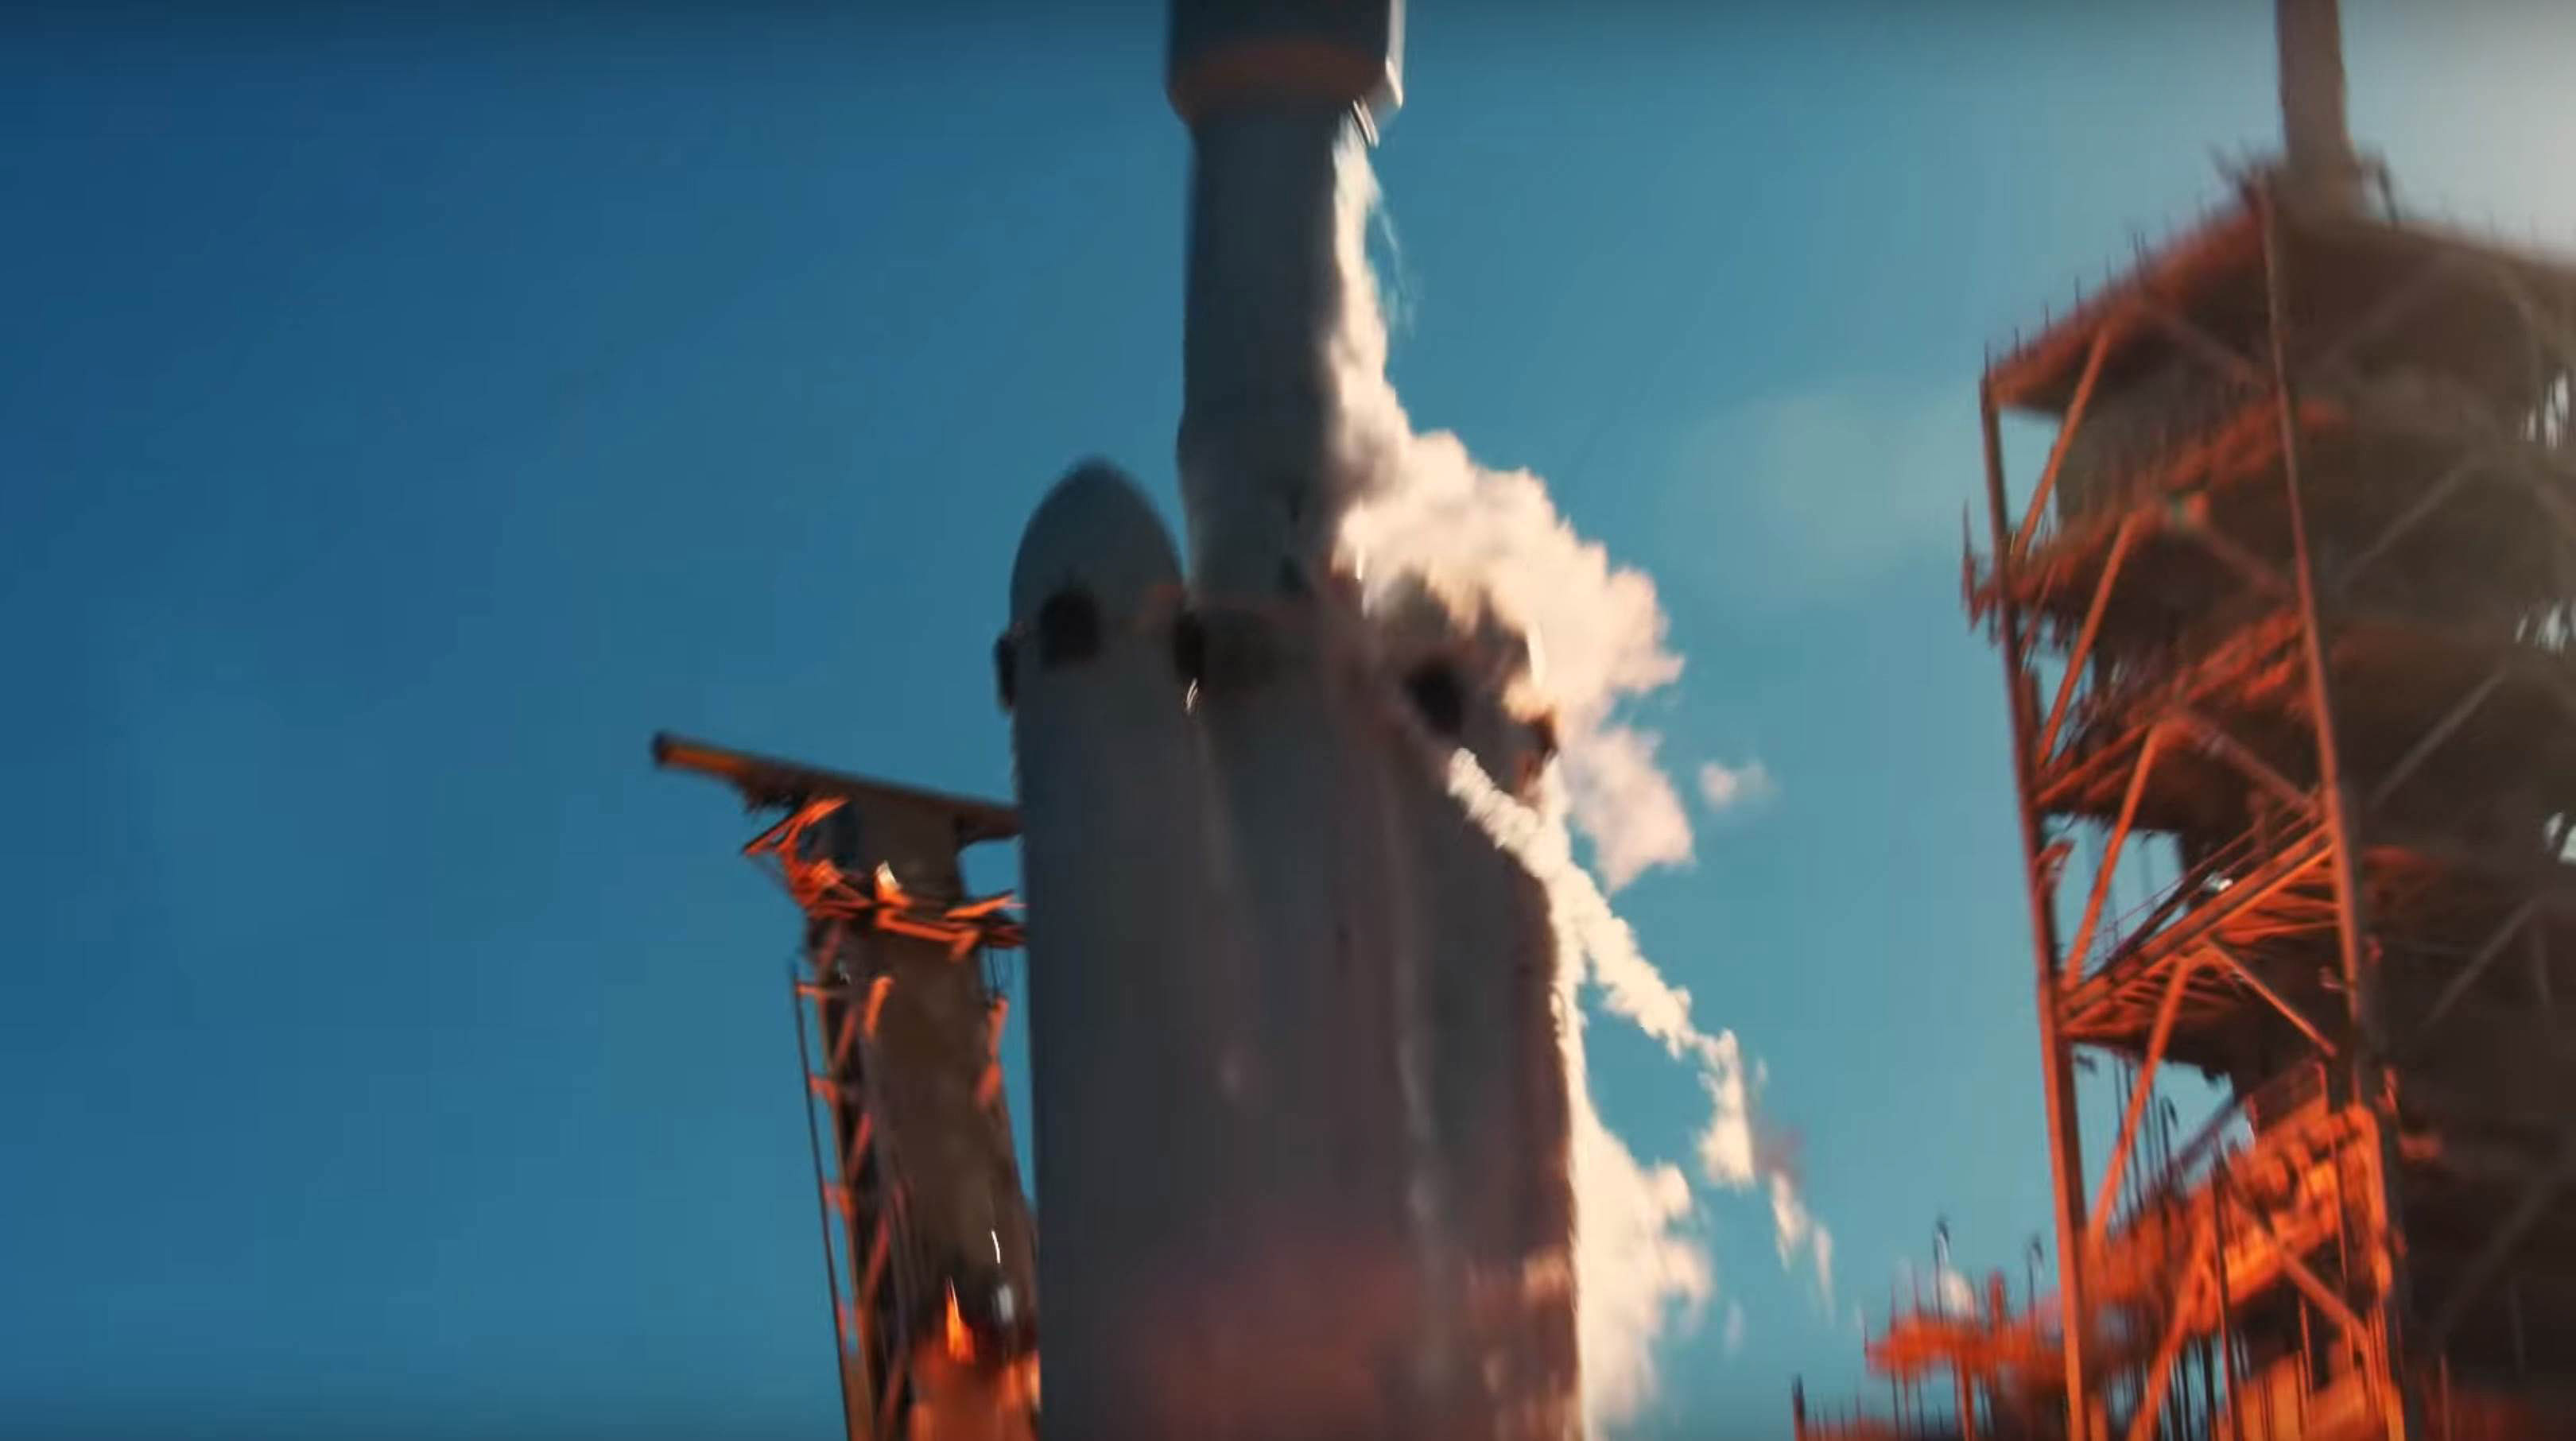 Falcon Heavy Flight 1 liftoff (SpaceX) 3